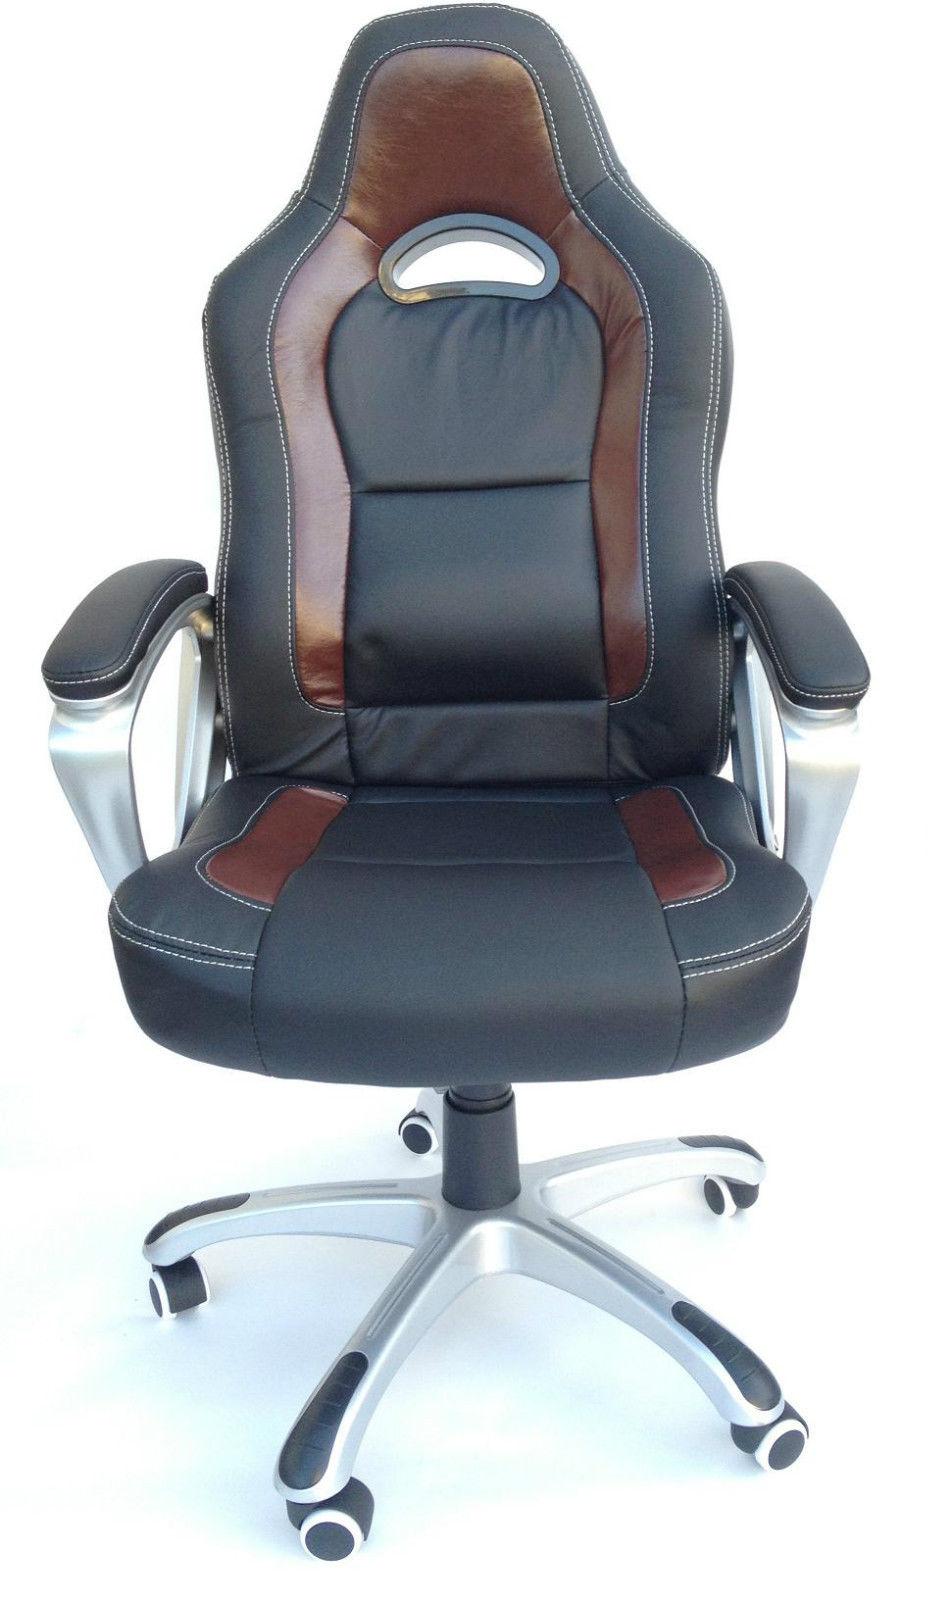 drehstuhl sportsitz chefsessel b rostuhl stuhl racing schalensitz b ro racer ebay. Black Bedroom Furniture Sets. Home Design Ideas